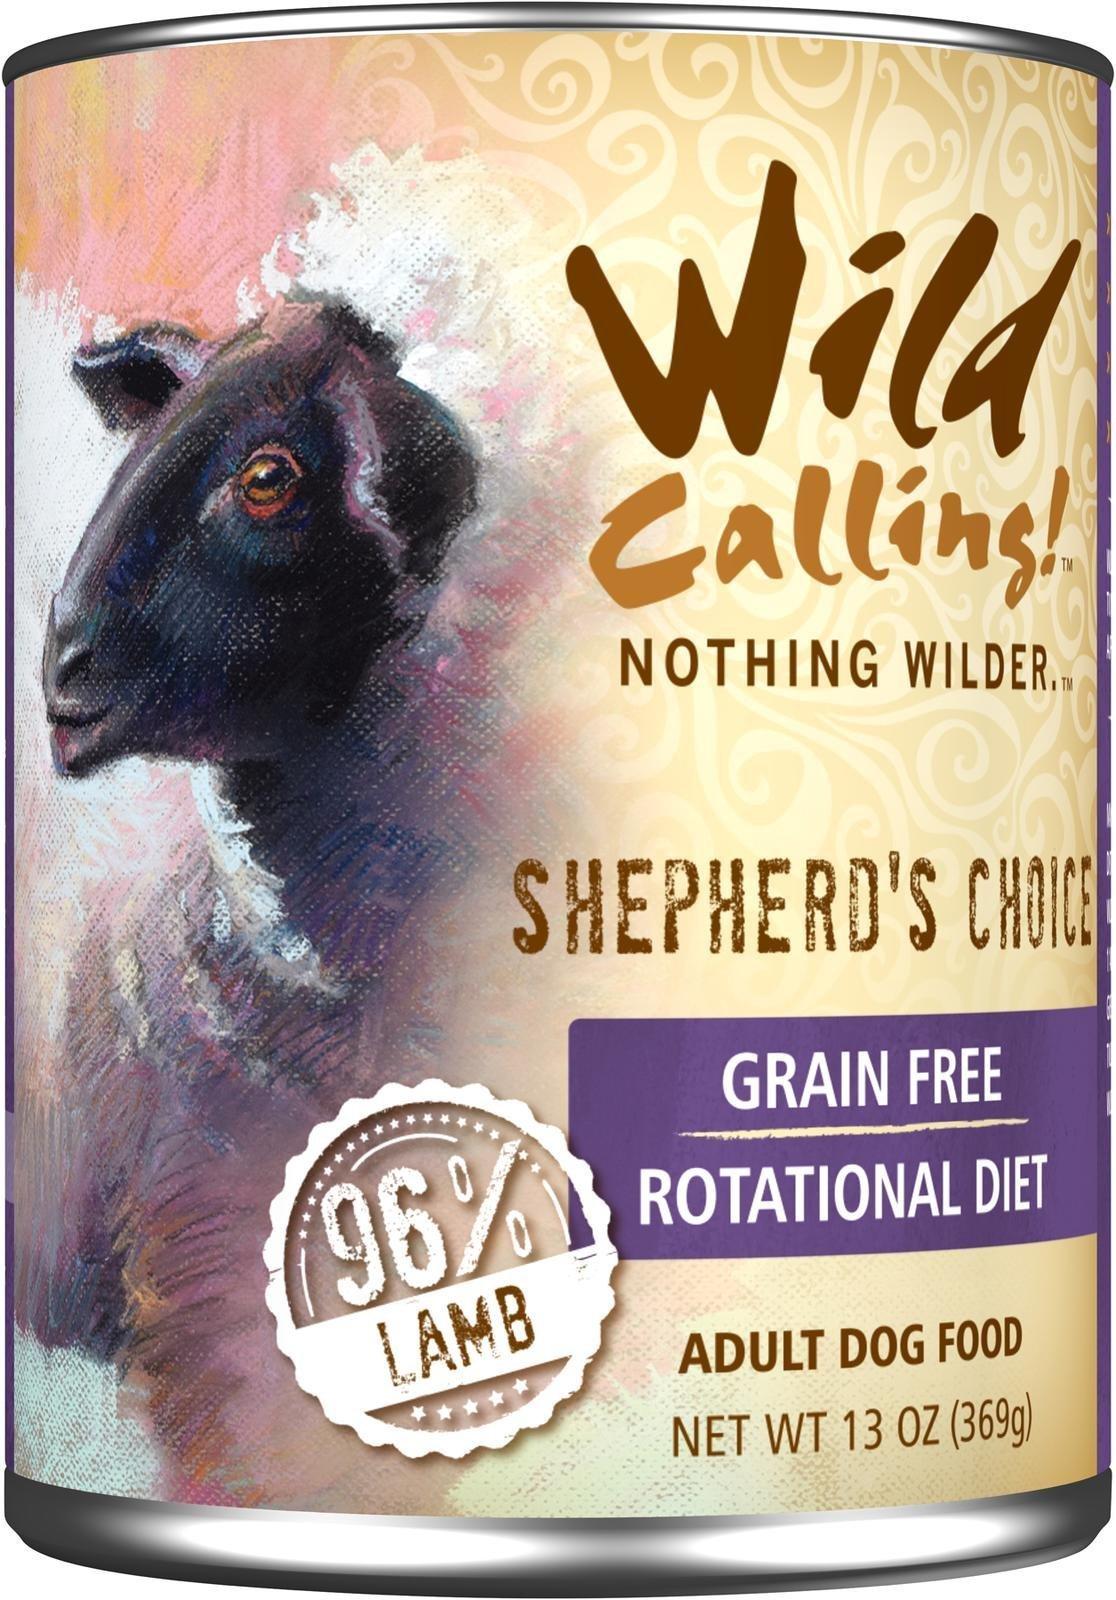 Wild Calling Canned Dog Food - Shepherd's Choice 96% Lamb - 13 oz - 12 ct